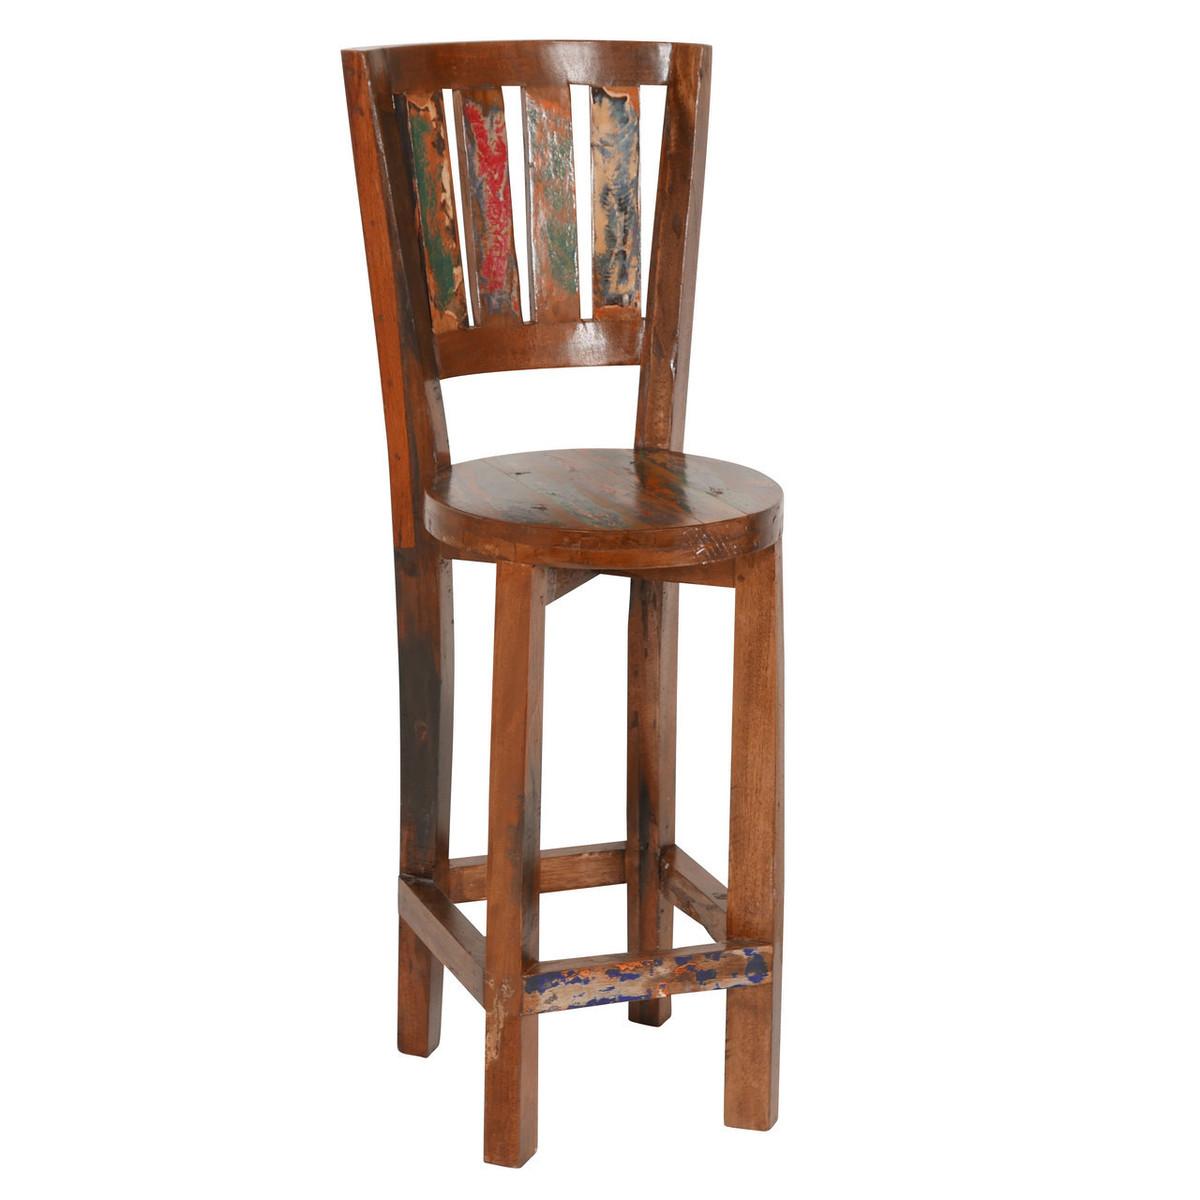 bar cottage cottagechic chic distressed belleescape stools back canedseating com cane pin counterandbarstools